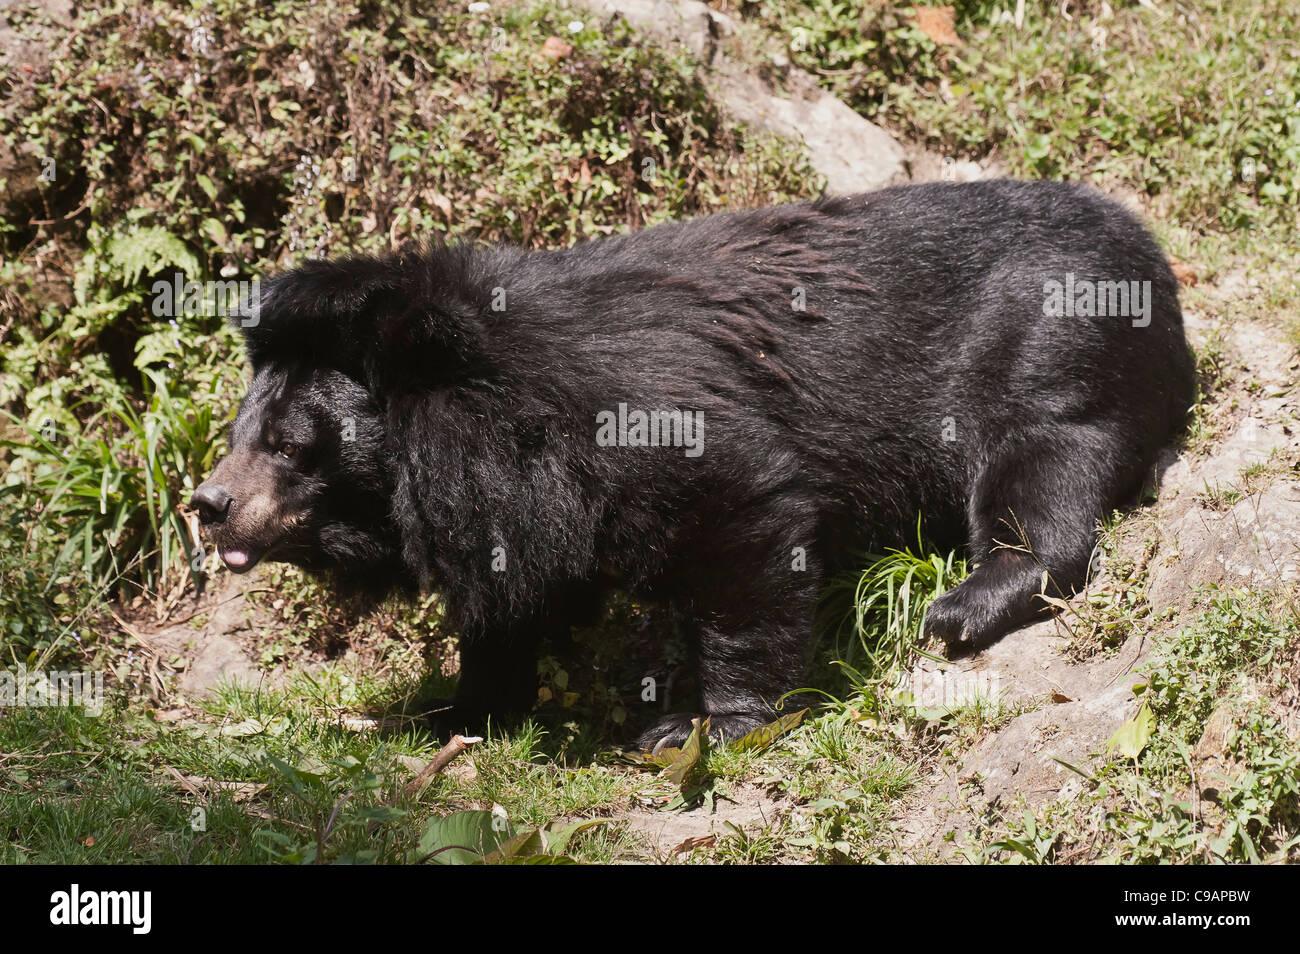 black bear attack - Stock Image